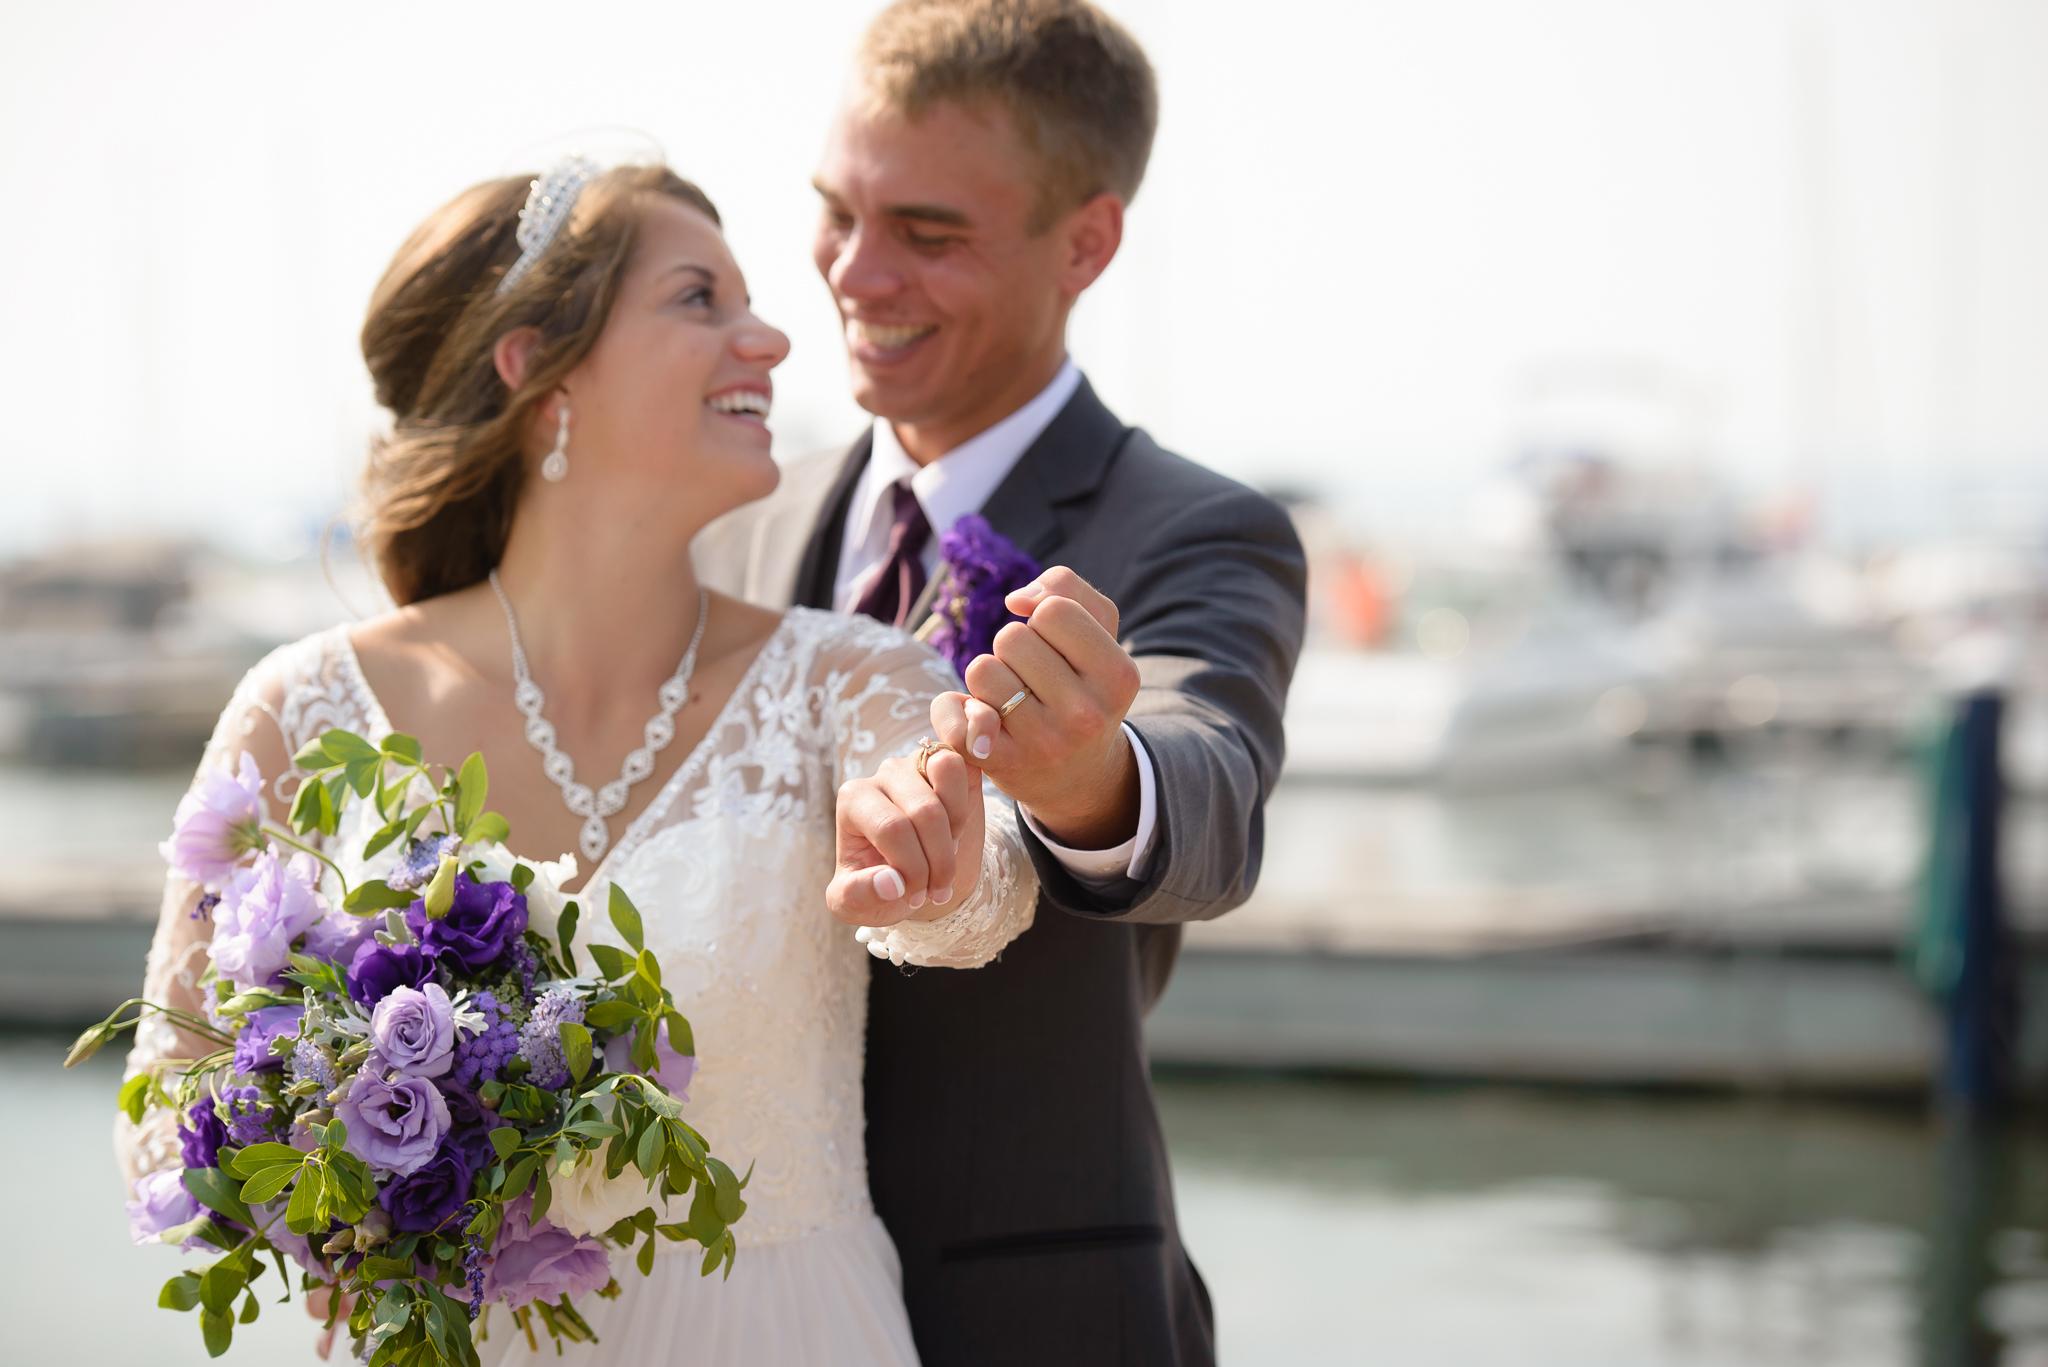 30-ashland washburn wedding photographyDSC_4625.jpg